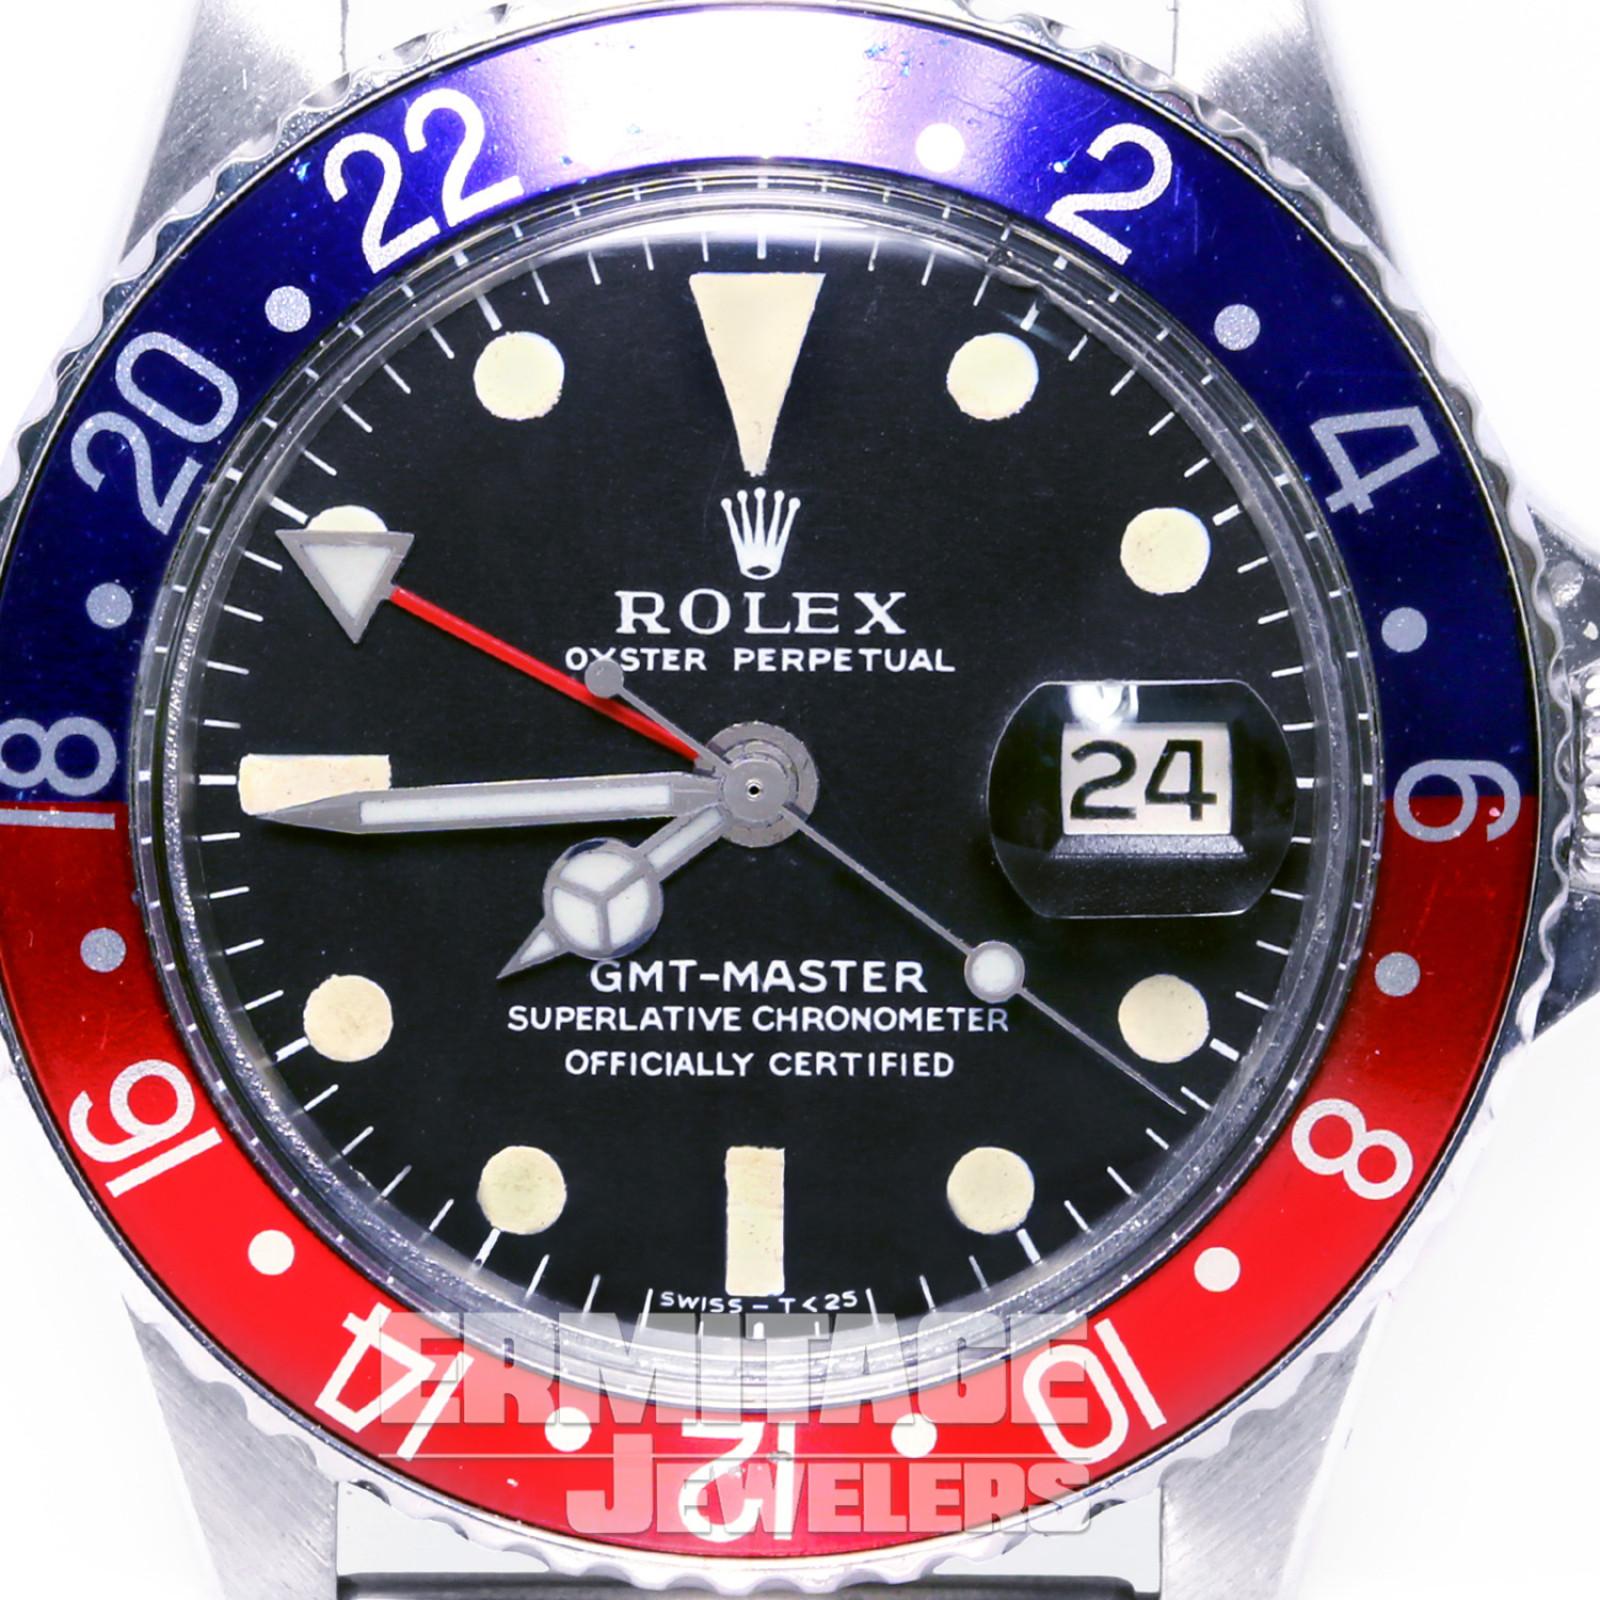 Vintage Rolex 1675 40 mm Steel on Strap Blue & Red Pepsi Style